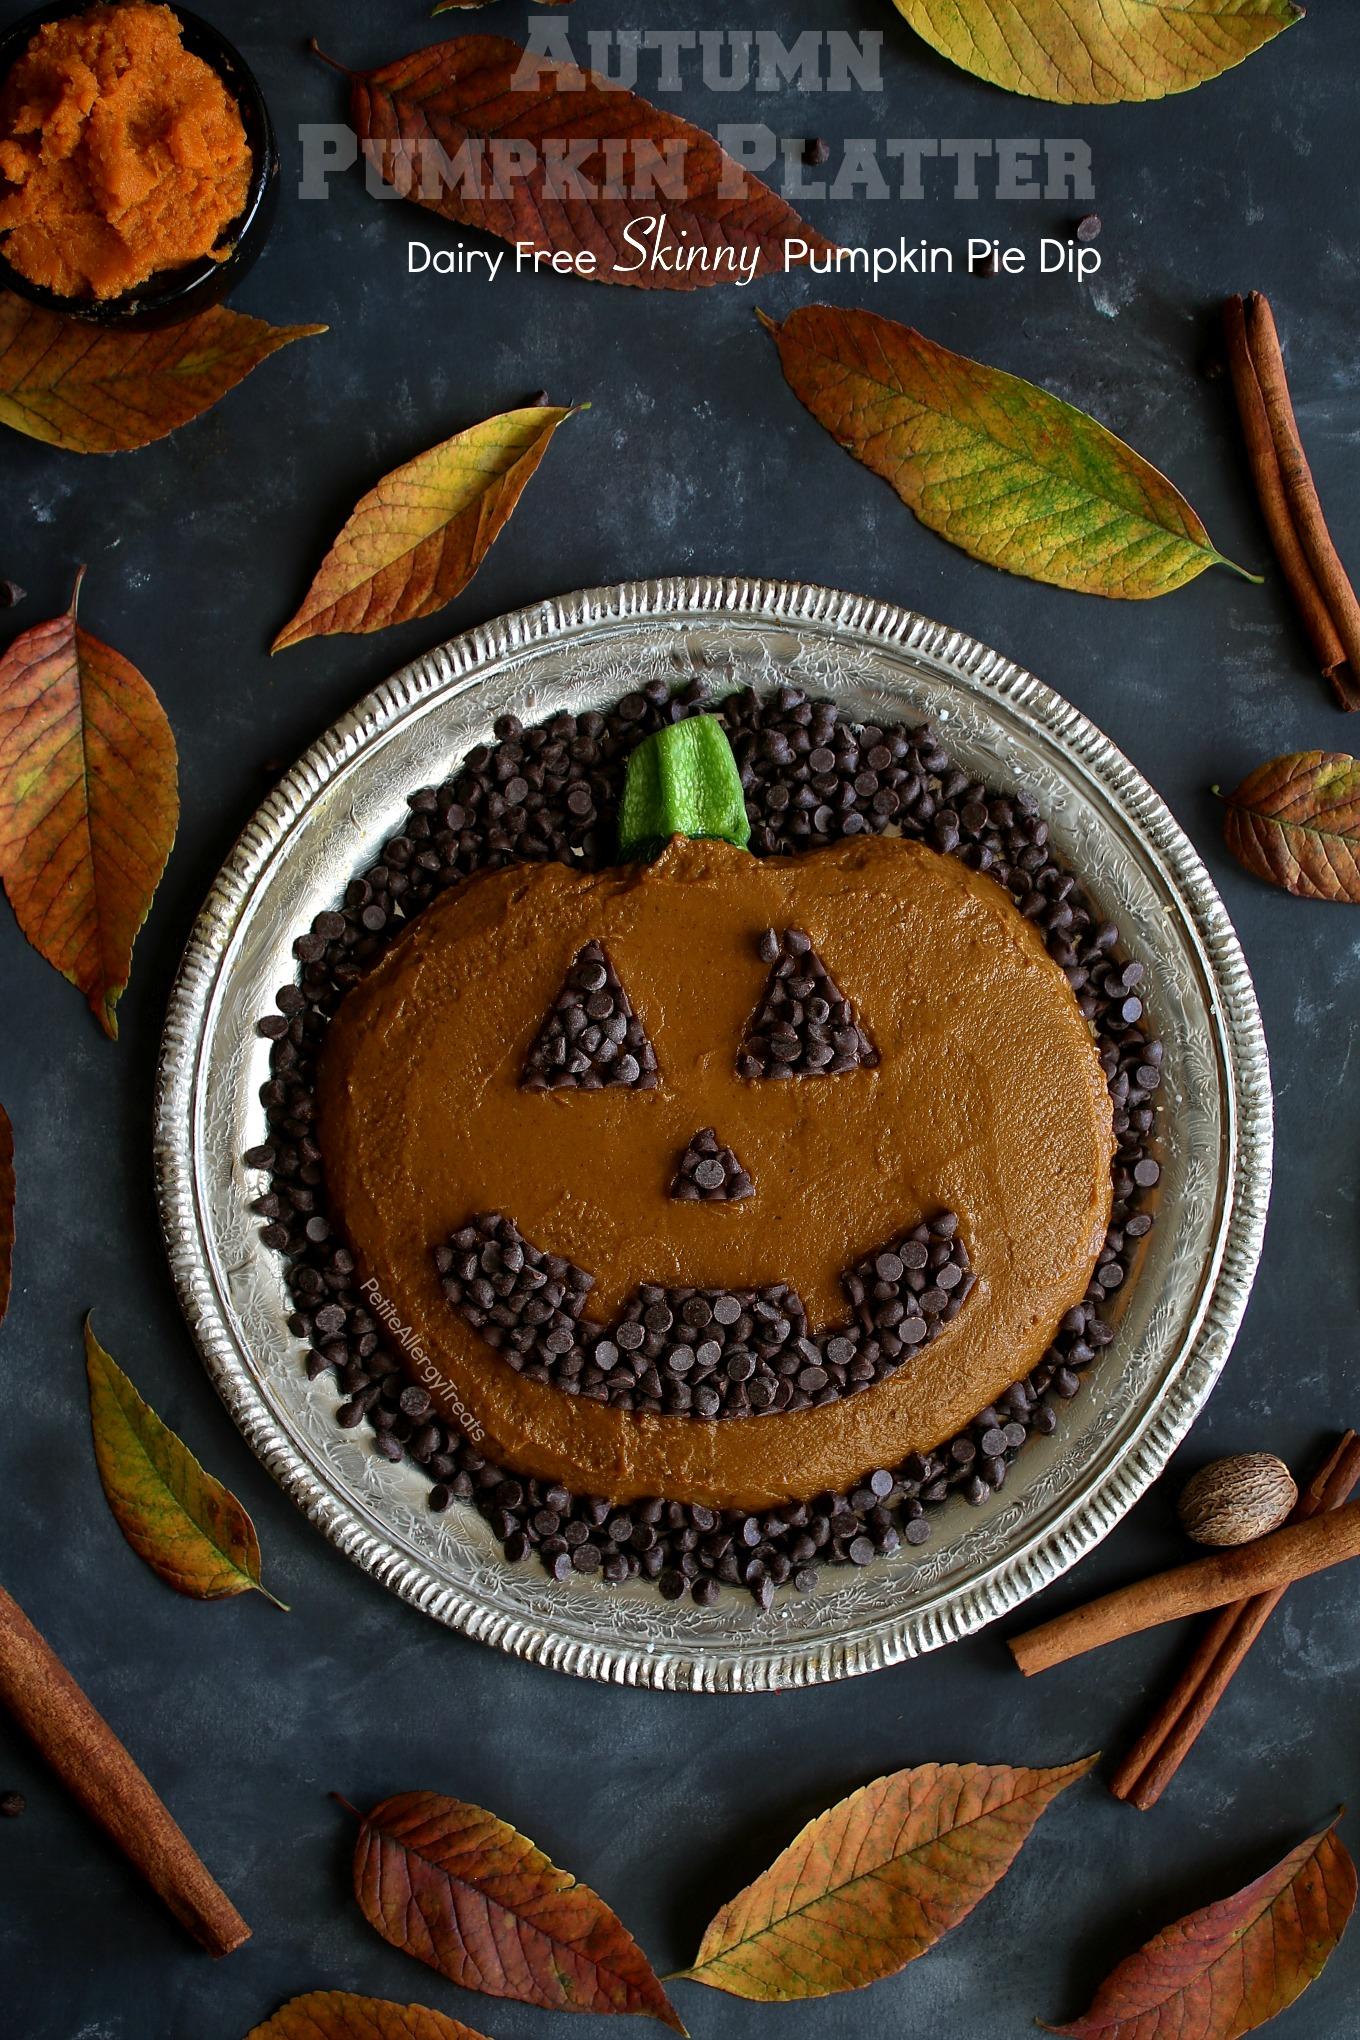 Dairy Free Skinny Pumpkin Pie Dip Recipe (vegan)- Adorable pumpkin platter for Fall, Halloween or Autumn parties! Food Allergy friendly!